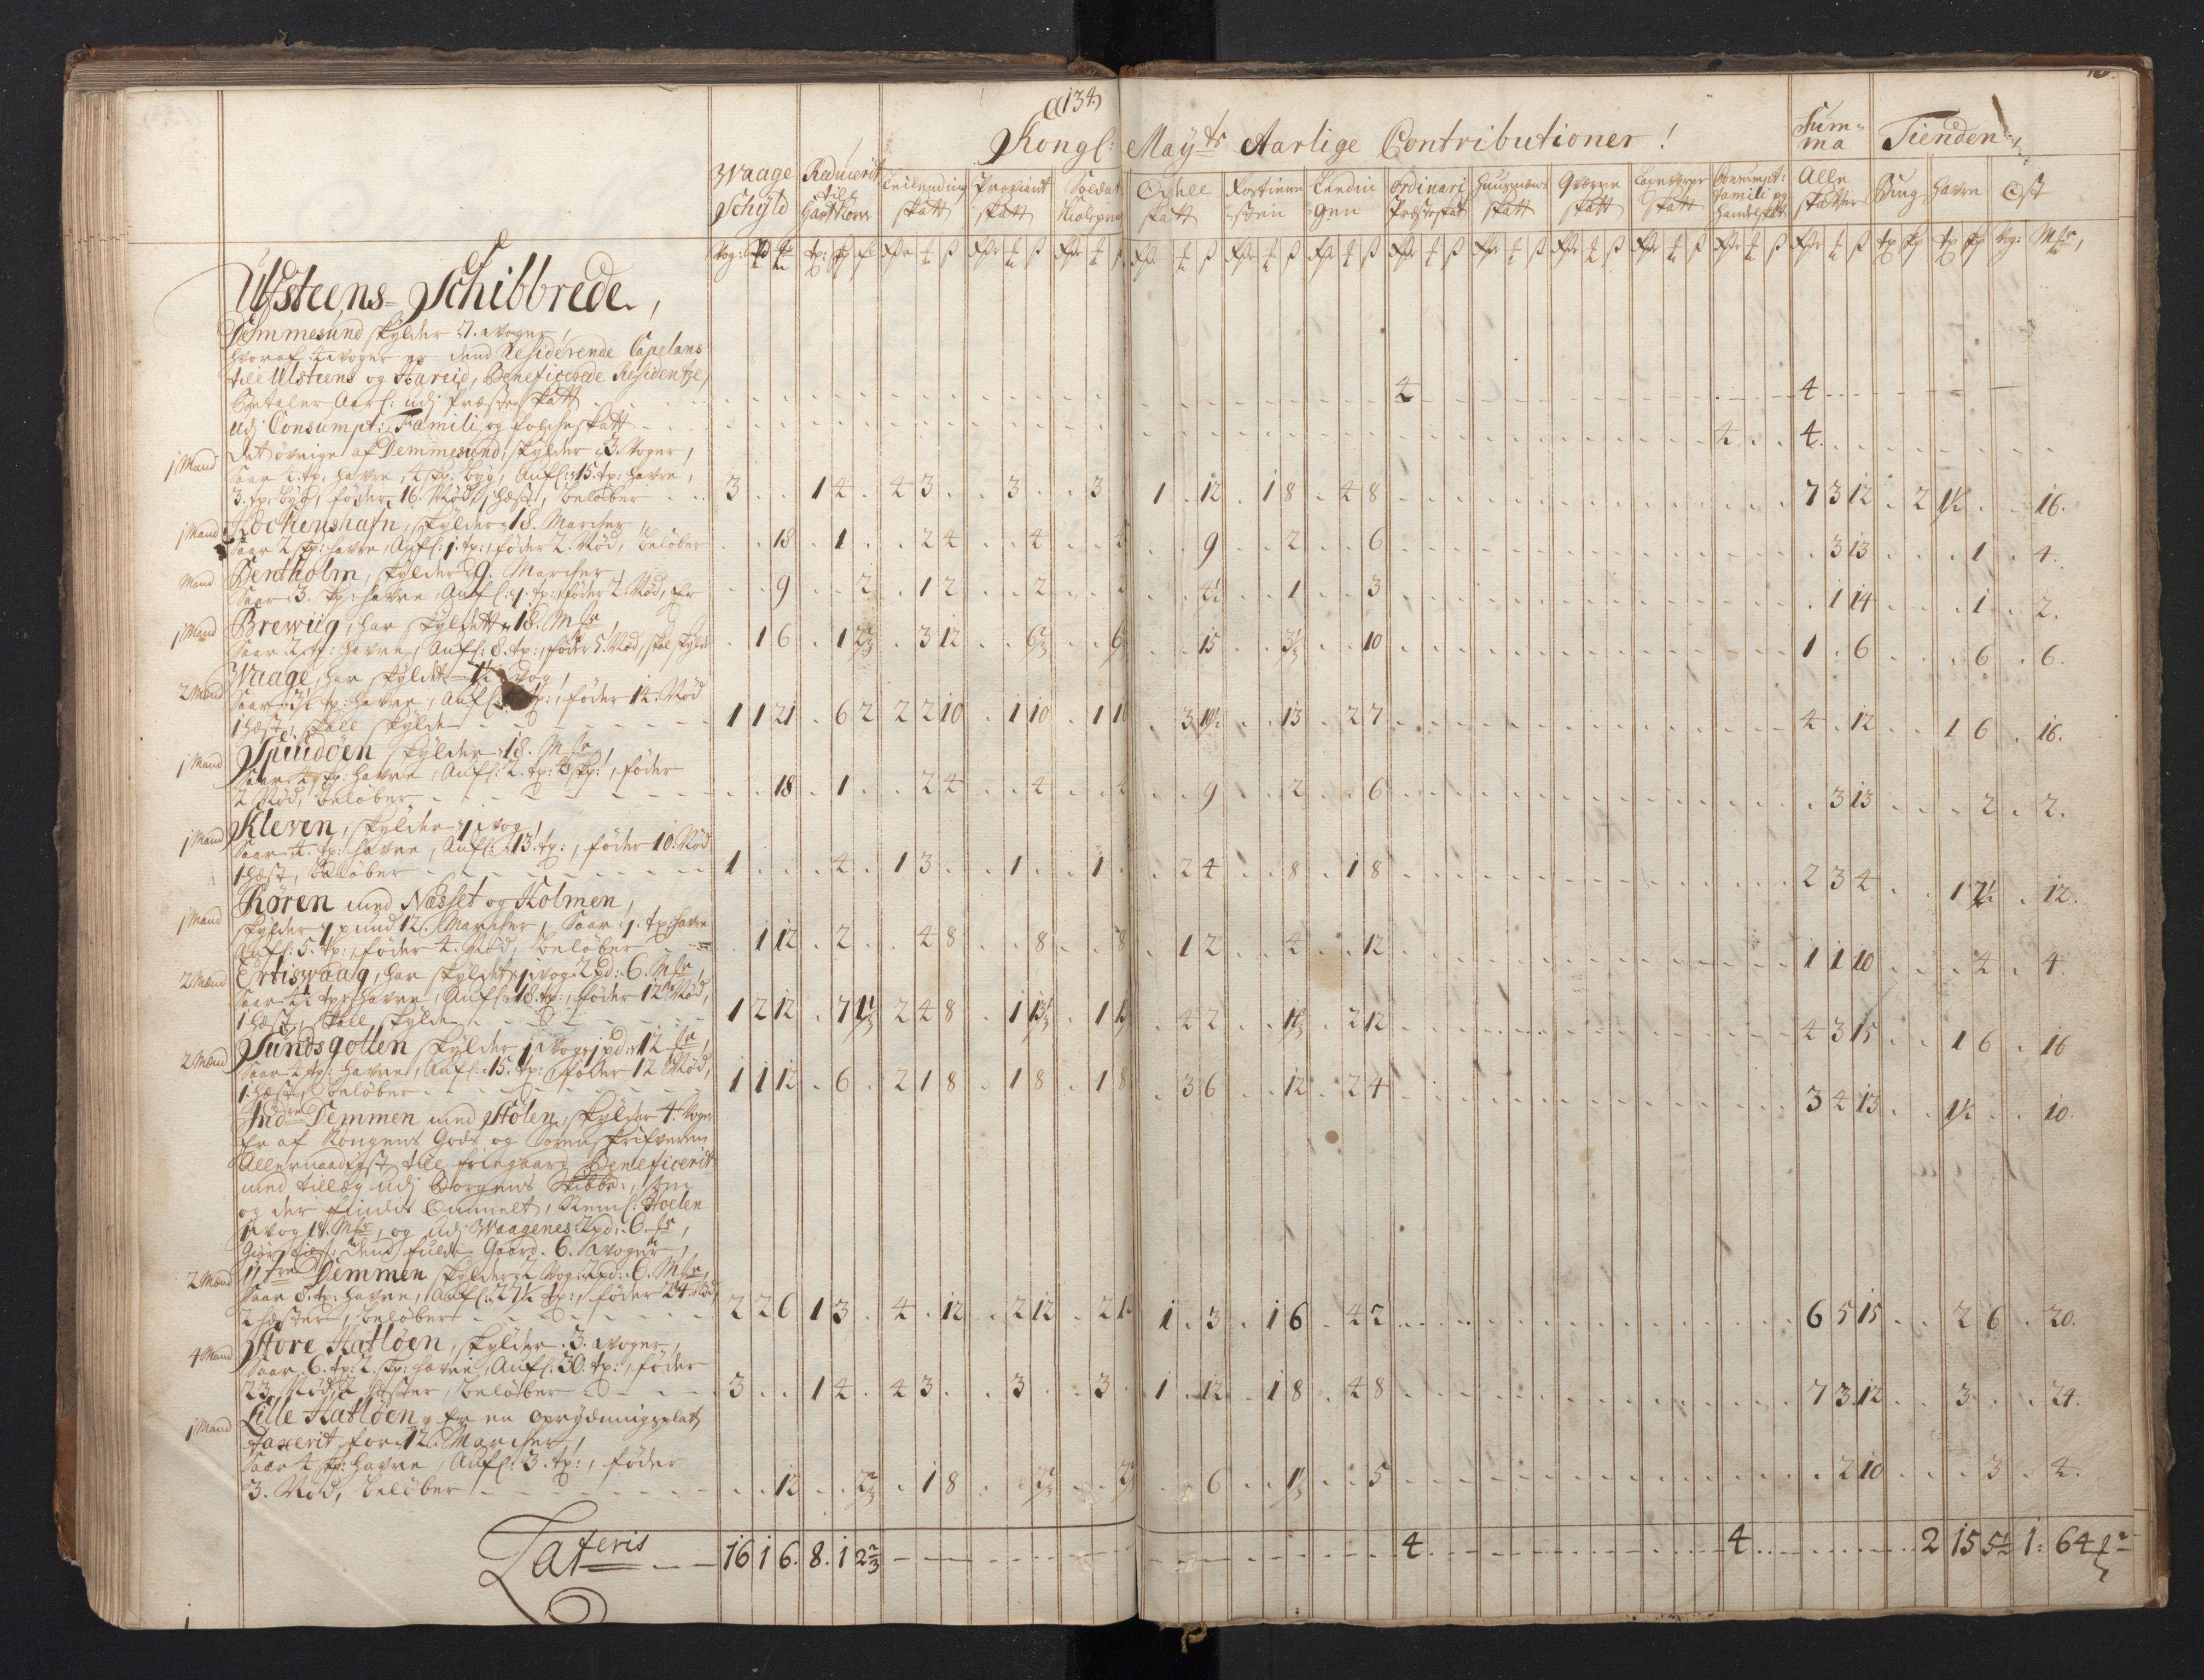 RA, Rentekammeret inntil 1814, Realistisk ordnet avdeling, N/Nb/Nbf/L0149: Sunnmøre, prøvematrikkel, 1714, s. 133b-134a